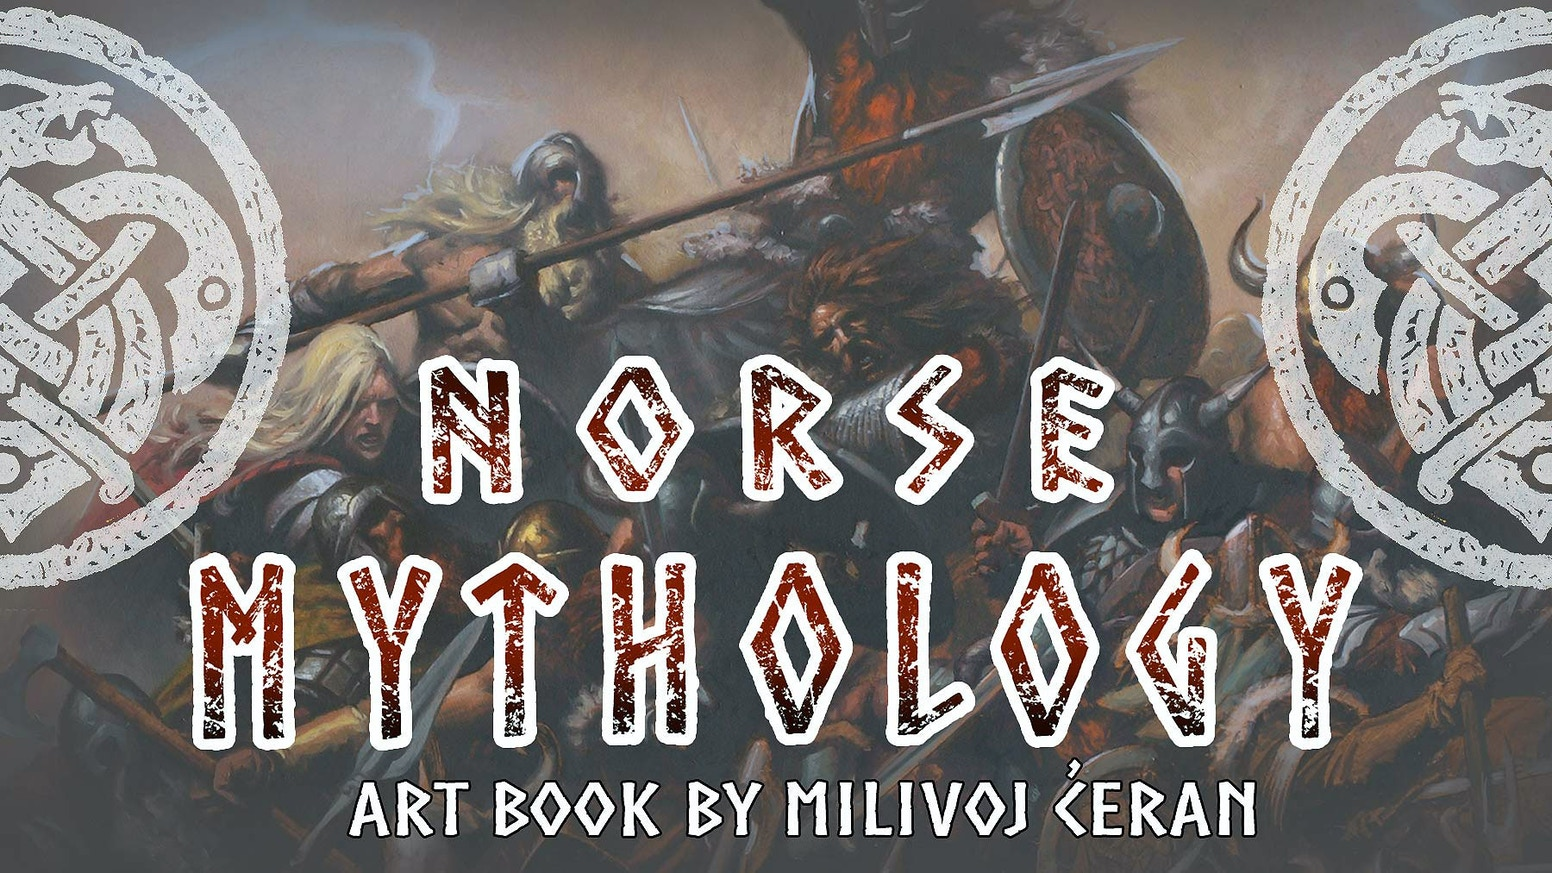 milivoj Ćeran norse mythology art book by artorder kickstarter